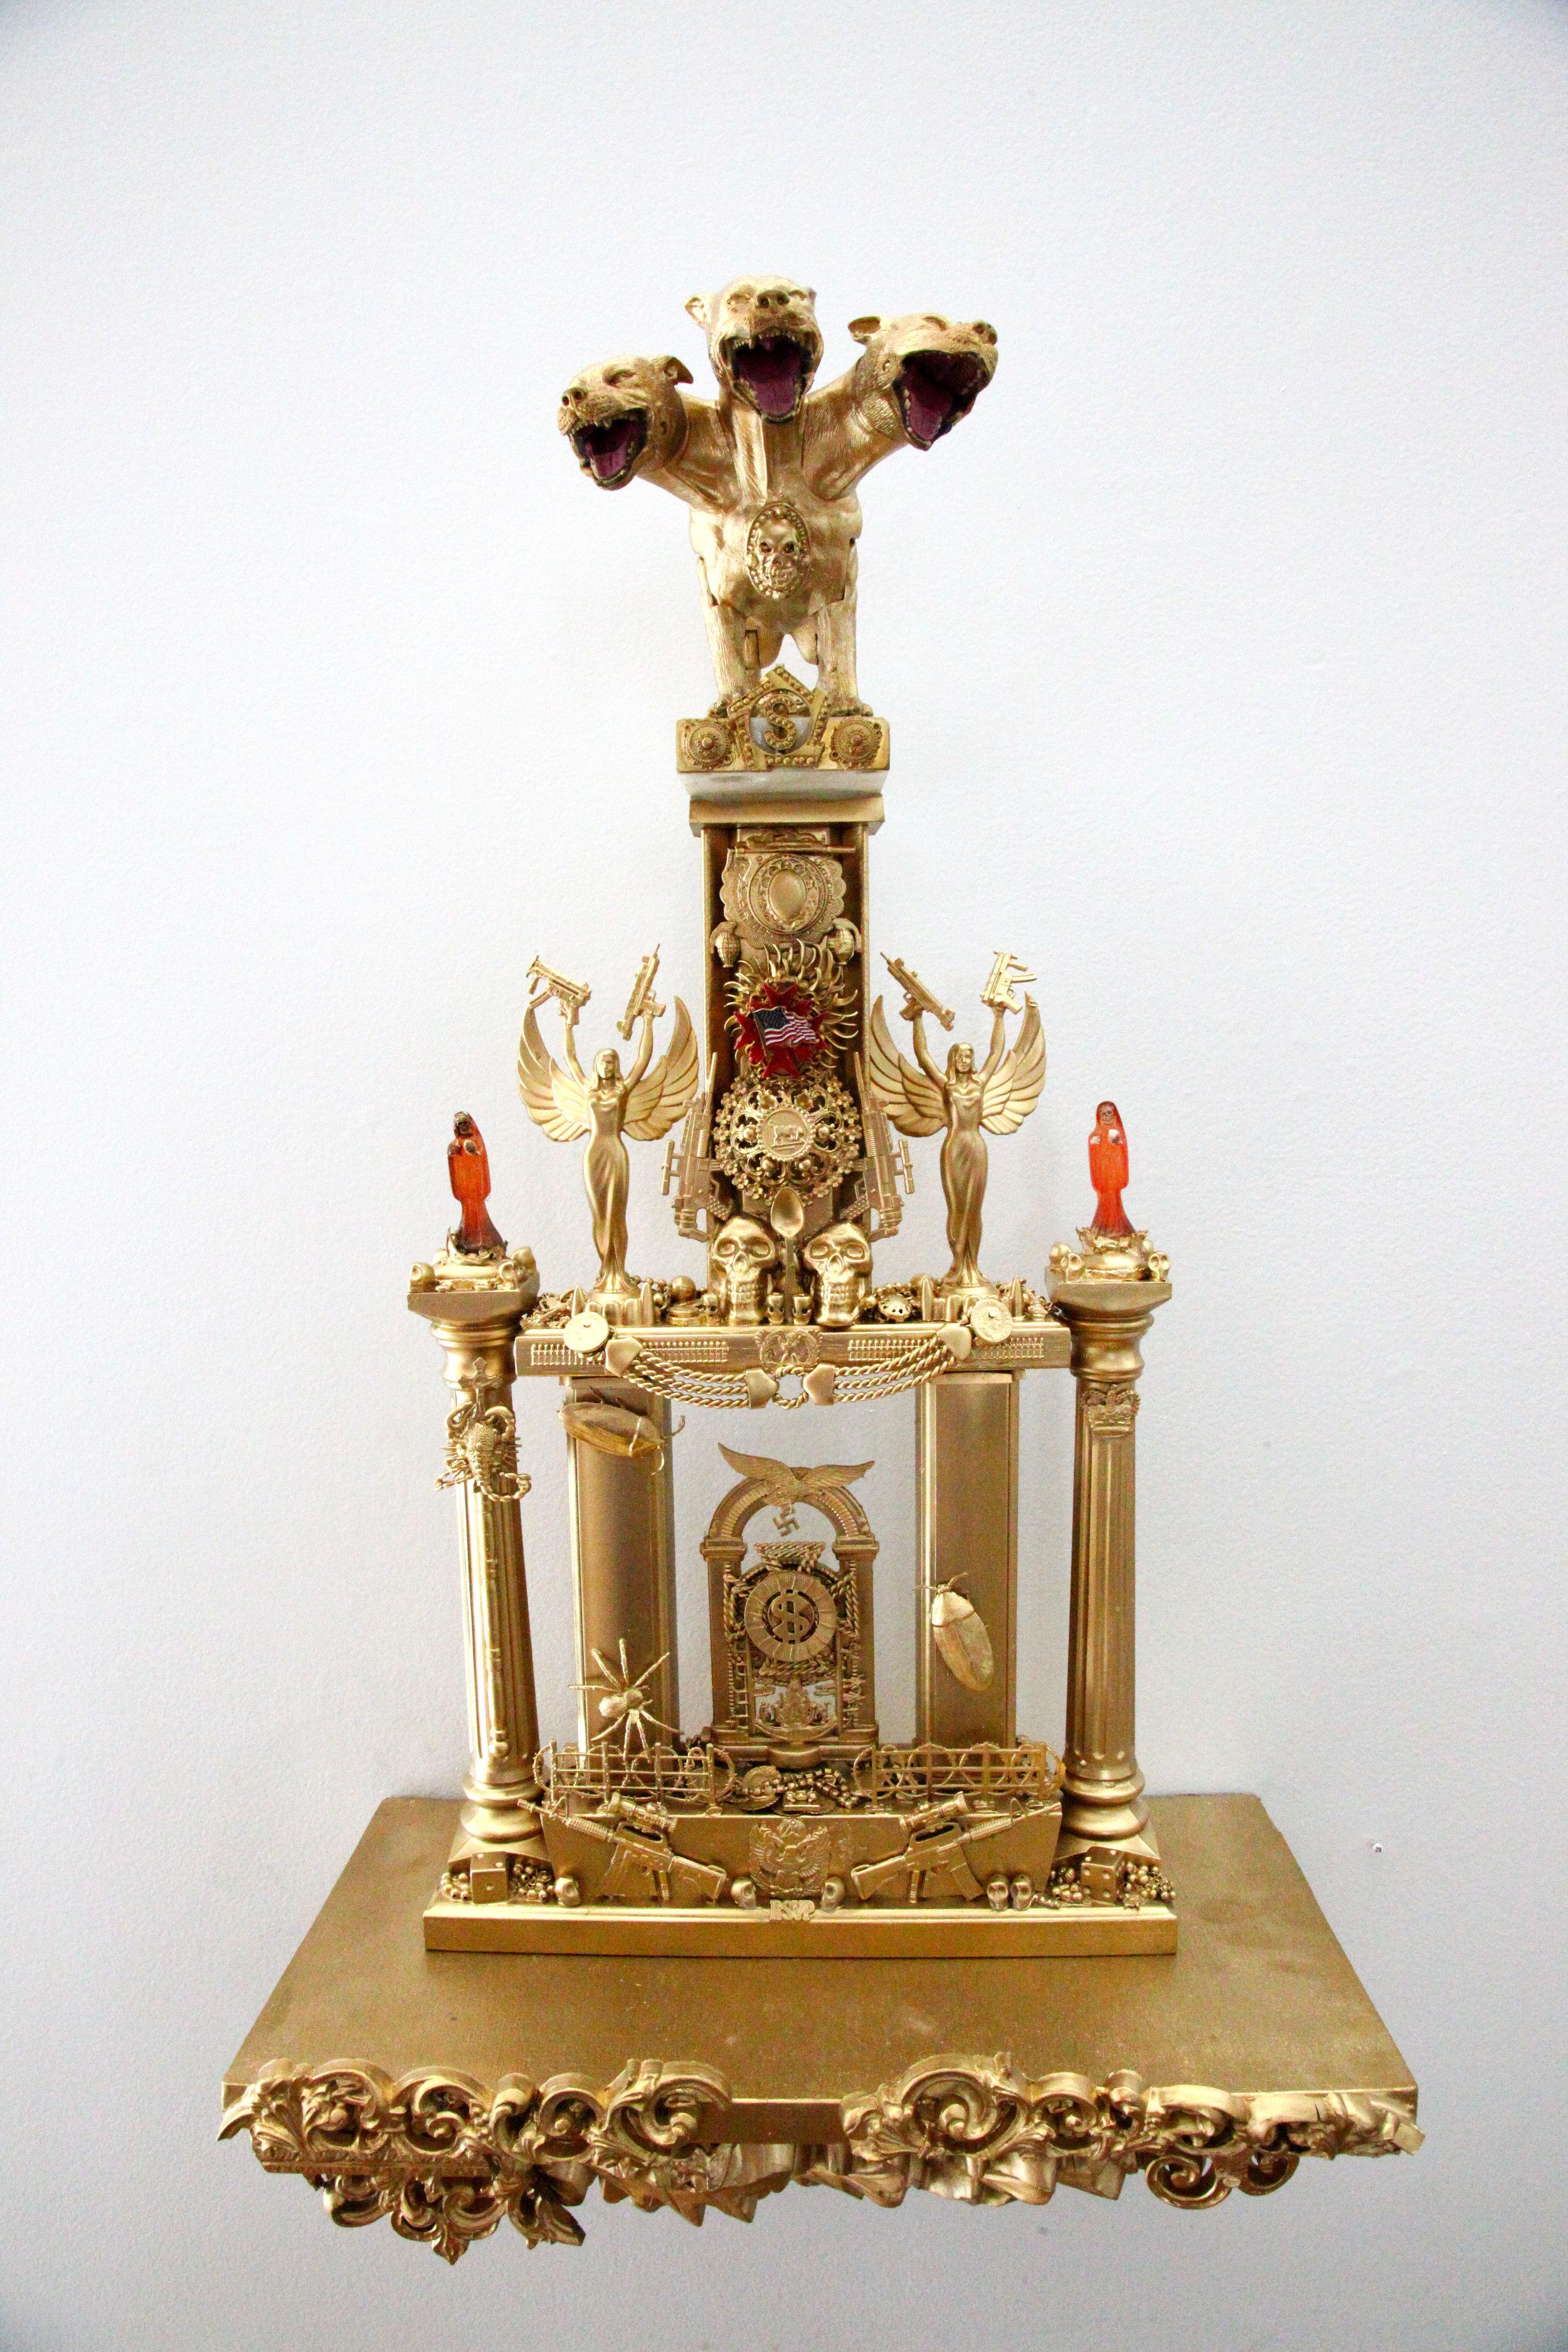 """Trophy #6 -- Cerebus, The Guardian of the Gates of Hell""  Mixed media, found objects  26"" x 12 1/2"" w/o shelf, 33"" x 17 1/2"" w/shelf  2016"